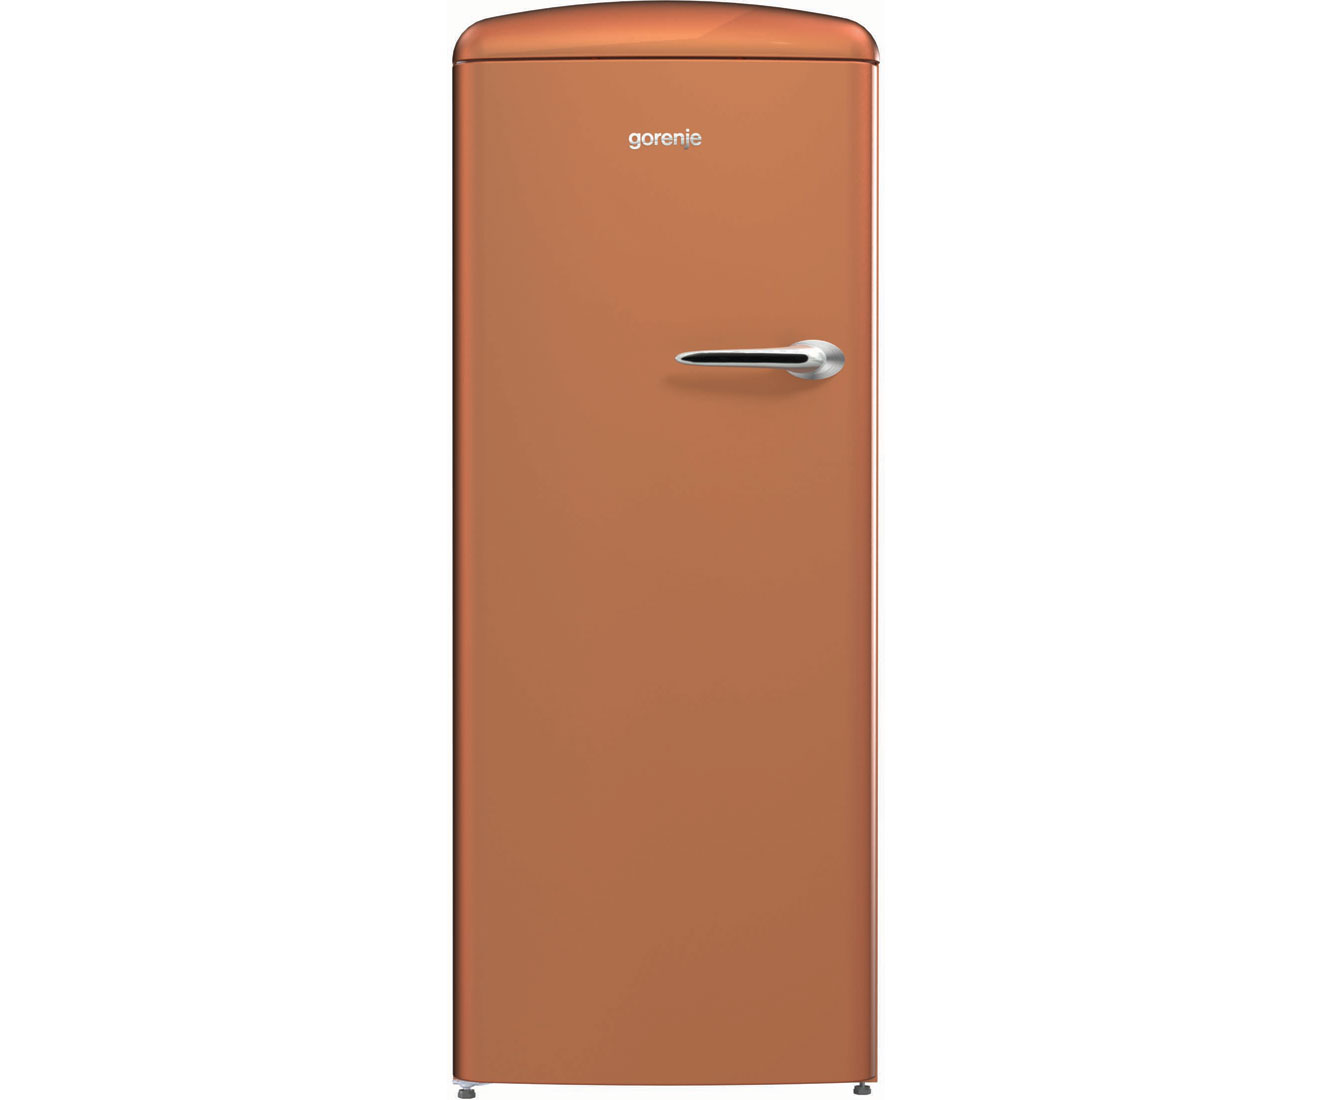 Gorenje Kühlschrank Qualität : Gorenje r fx kühlschrank kühlschrank r anw gorenje